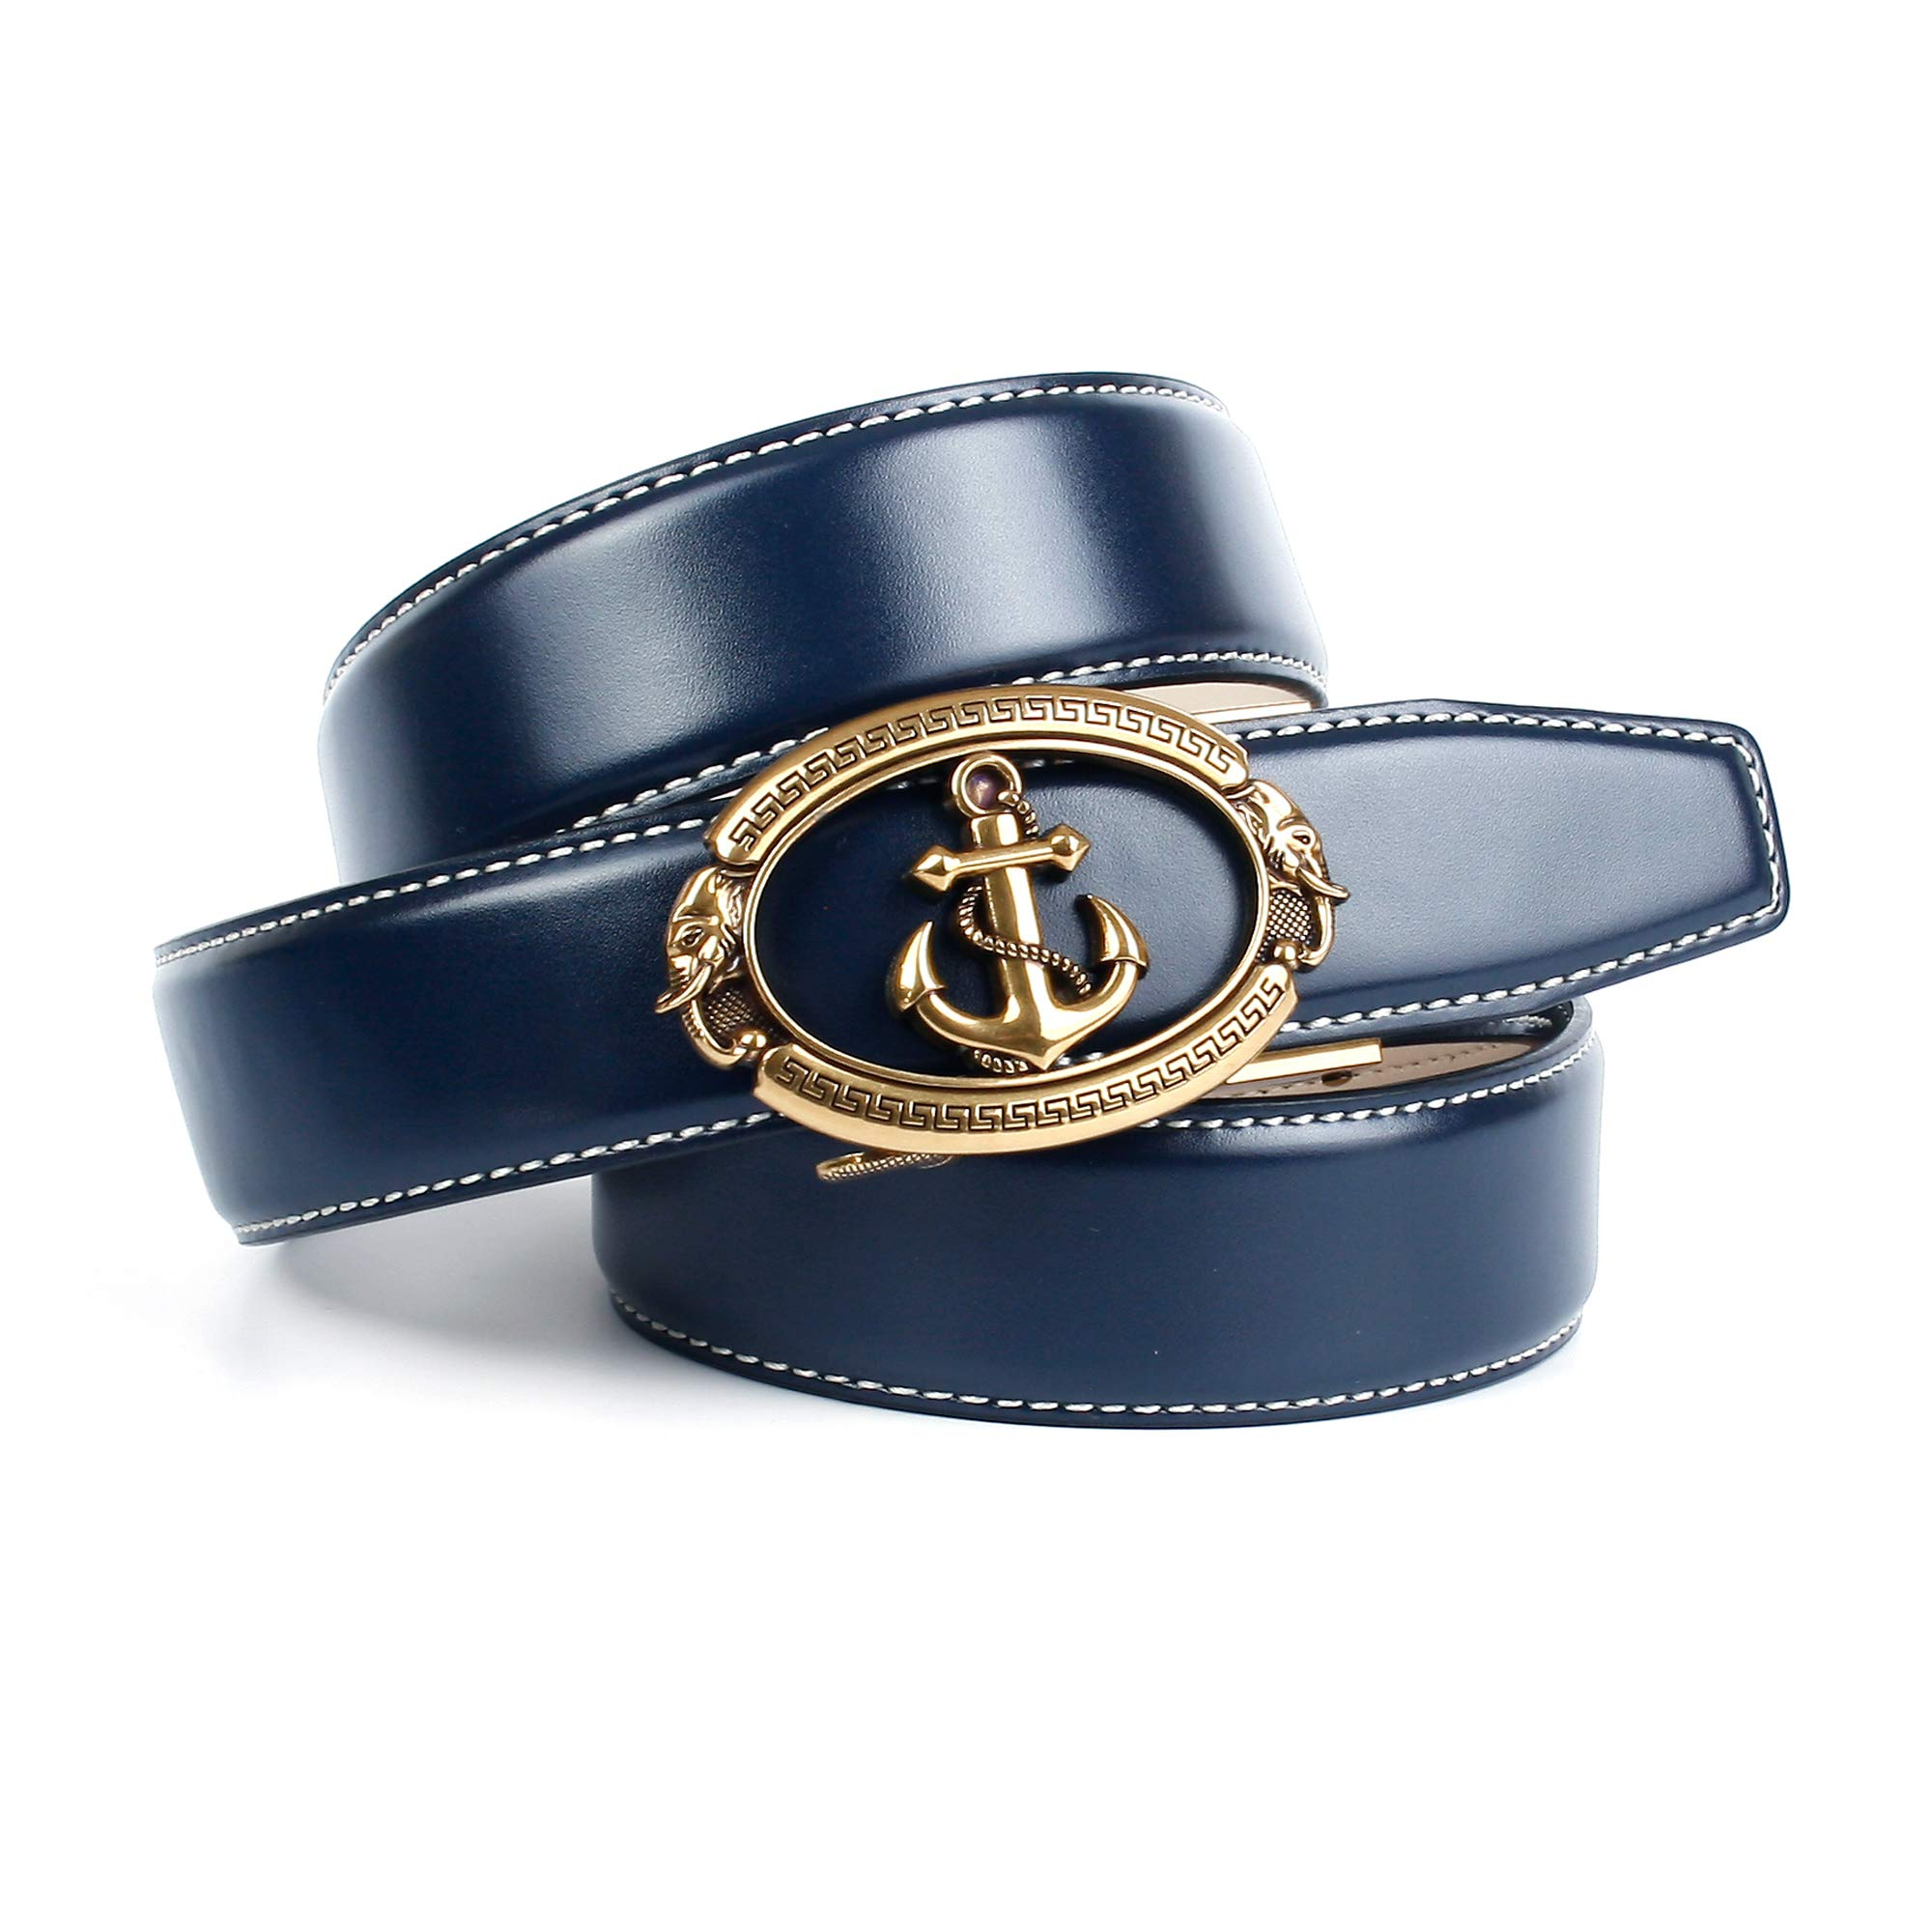 ws80 CeintureBleudunkelblau Anthoni 080115taille Fabricant100Homme C4an Crown WHE9ID2